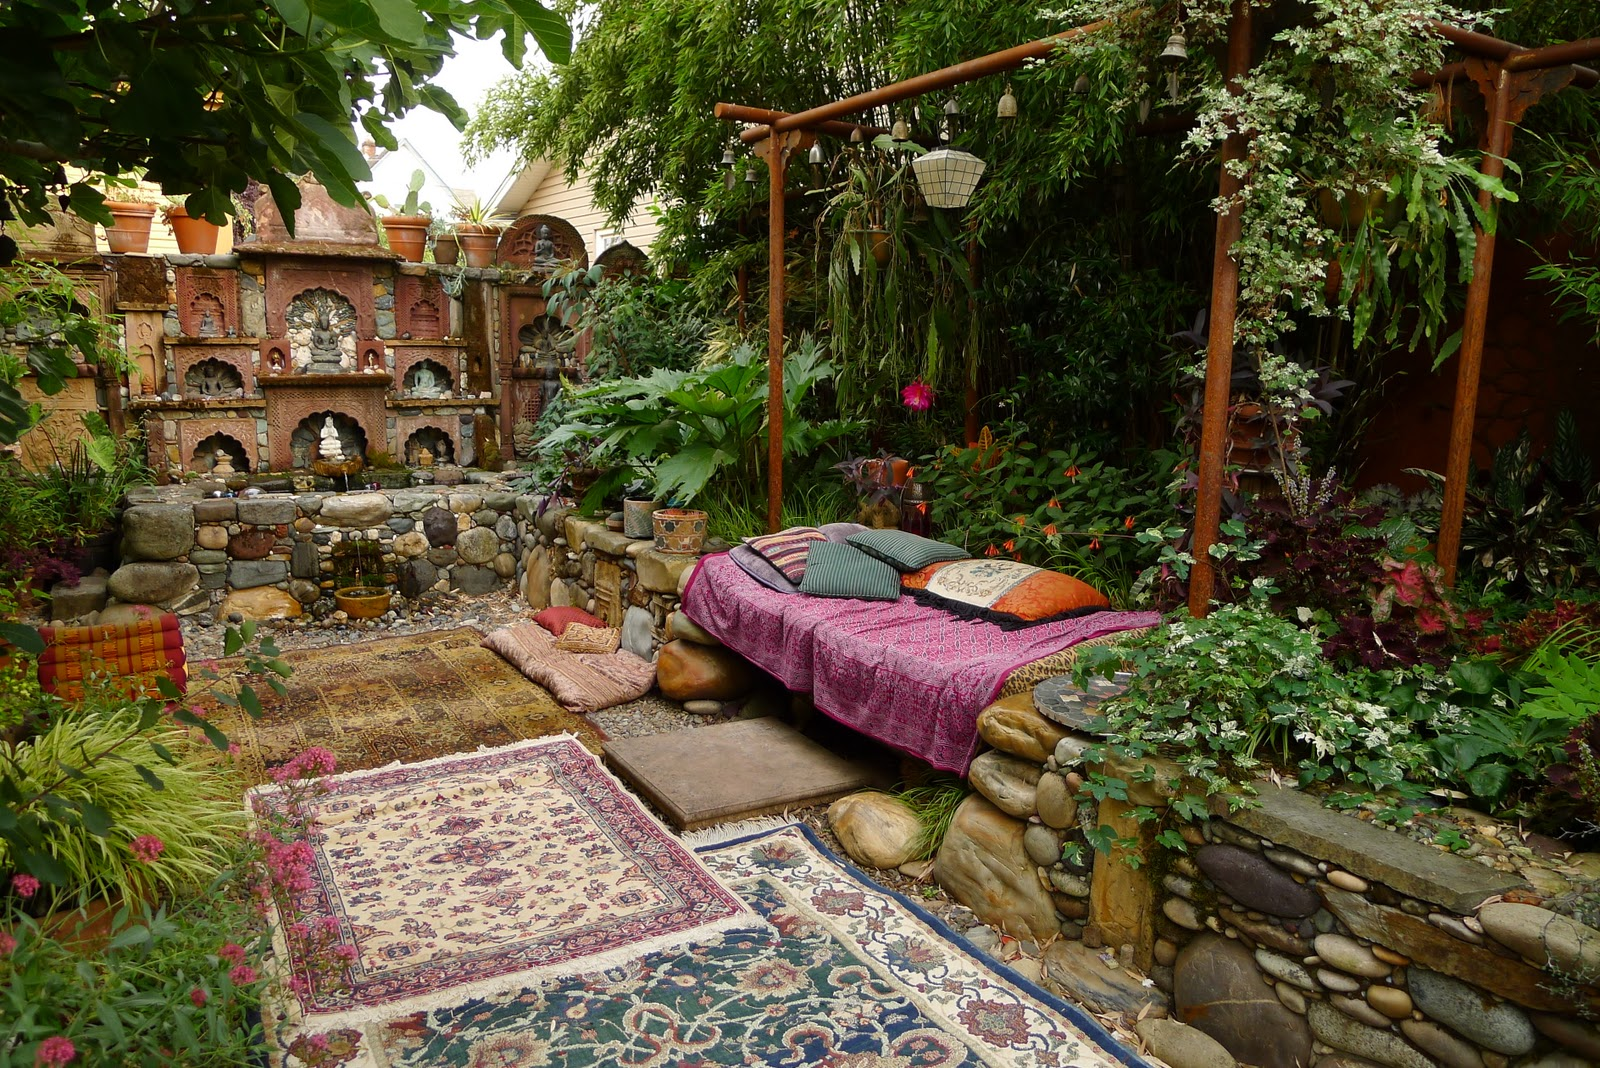 jeffrey bale's world of gardens: bathing in the garden